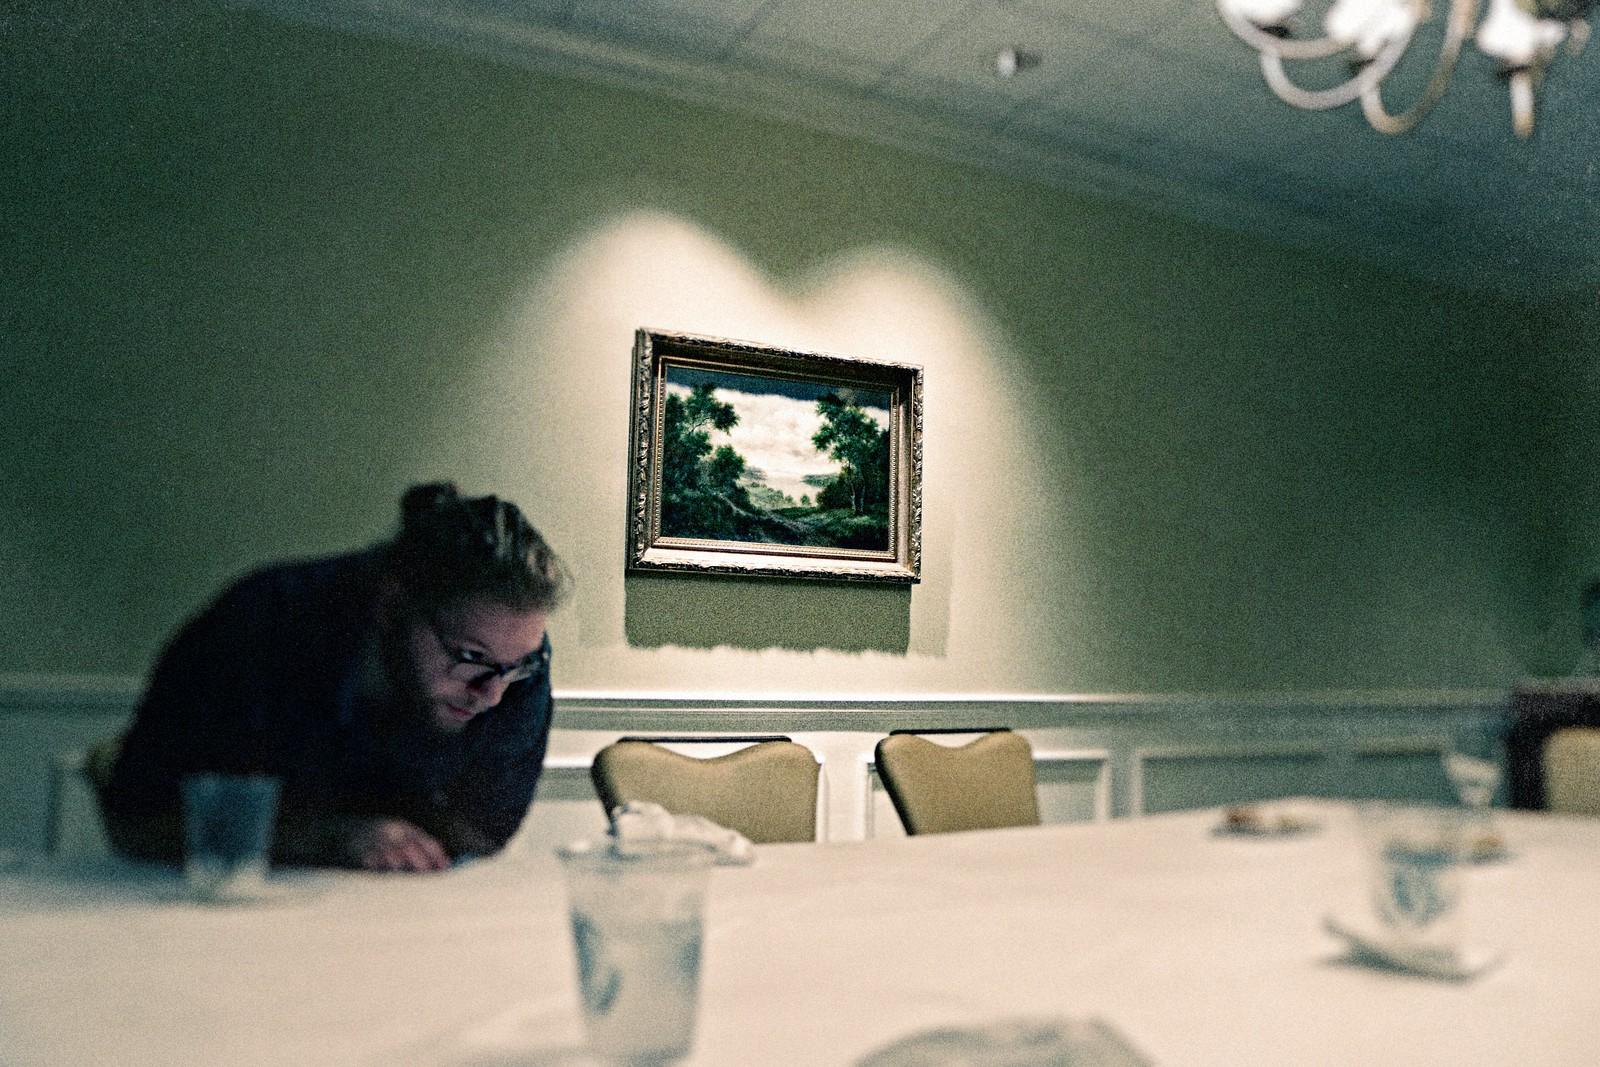 The Green Room. Nov 2015